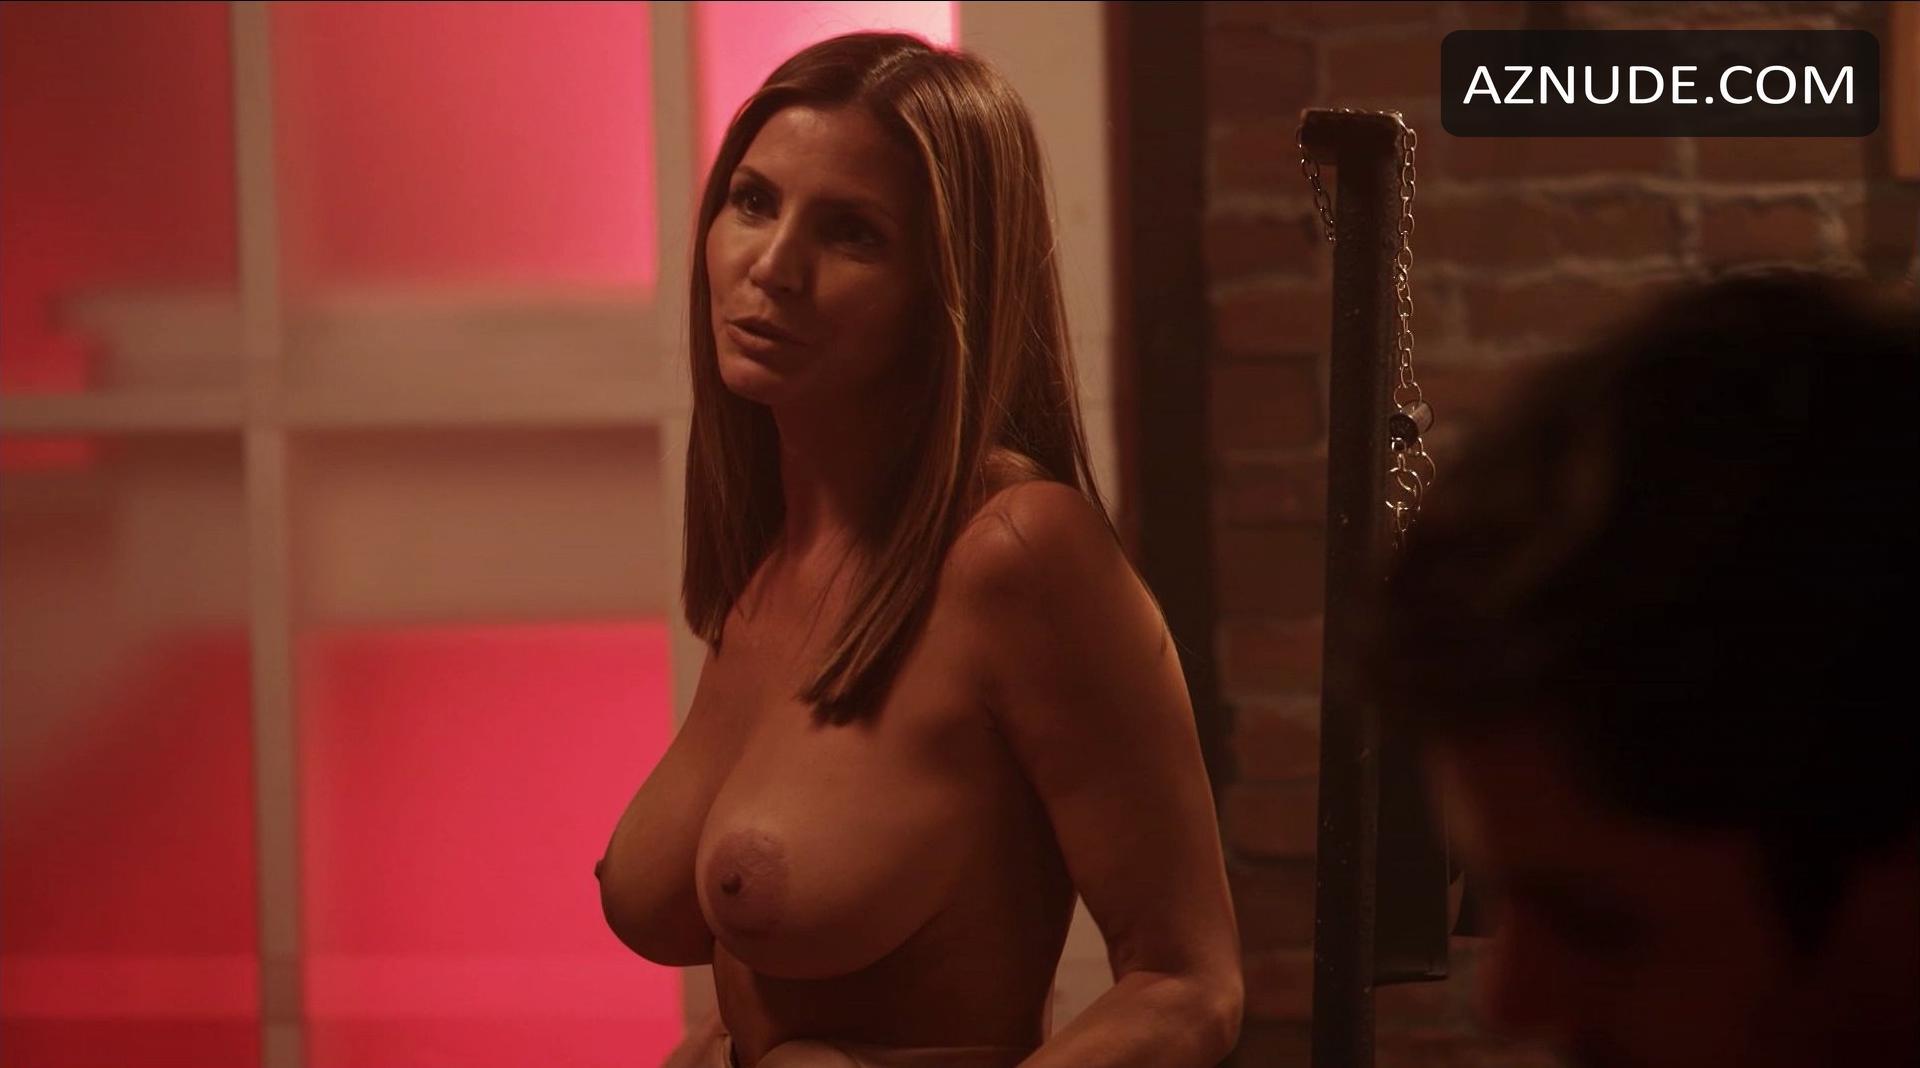 Charisma carpenter nude movies